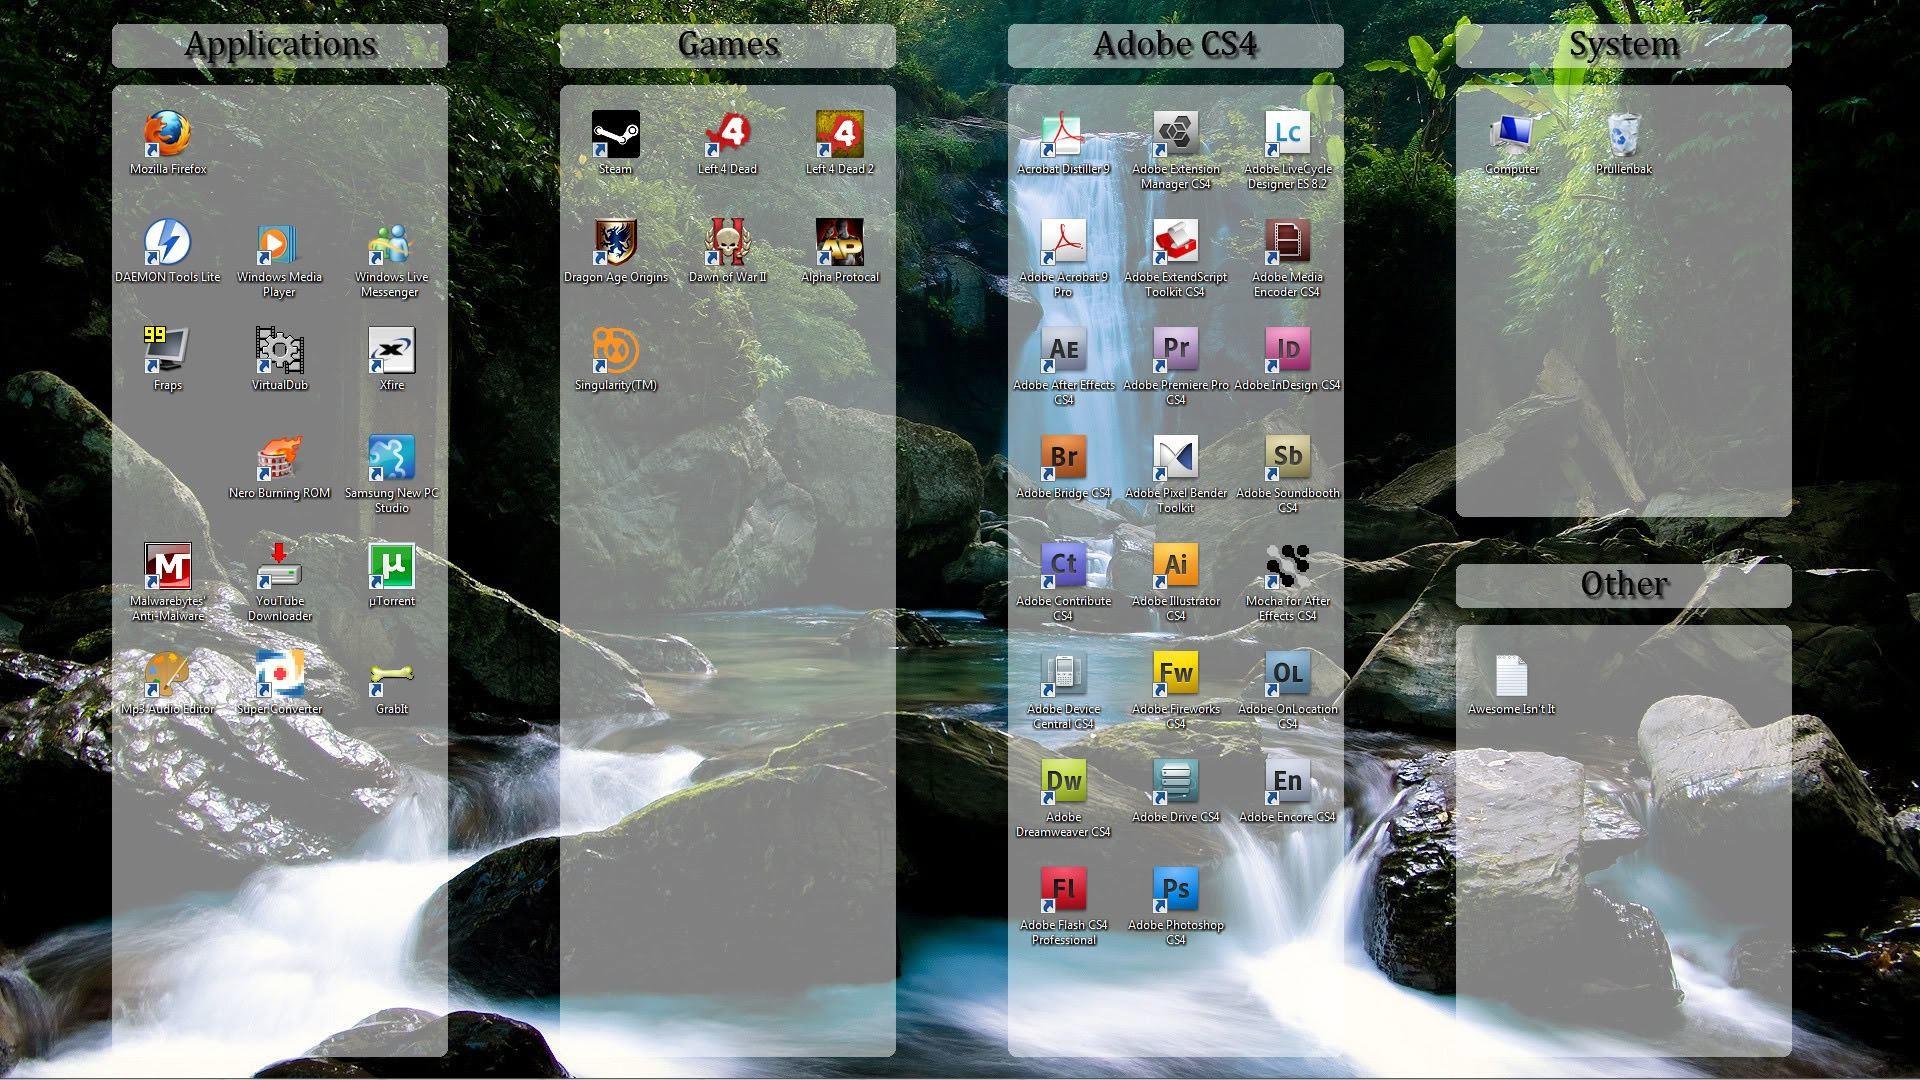 Desktop wallpaper icon organizer wallpapersafari – Wallpaper Organize  Desktop Wallpapersafari. Download